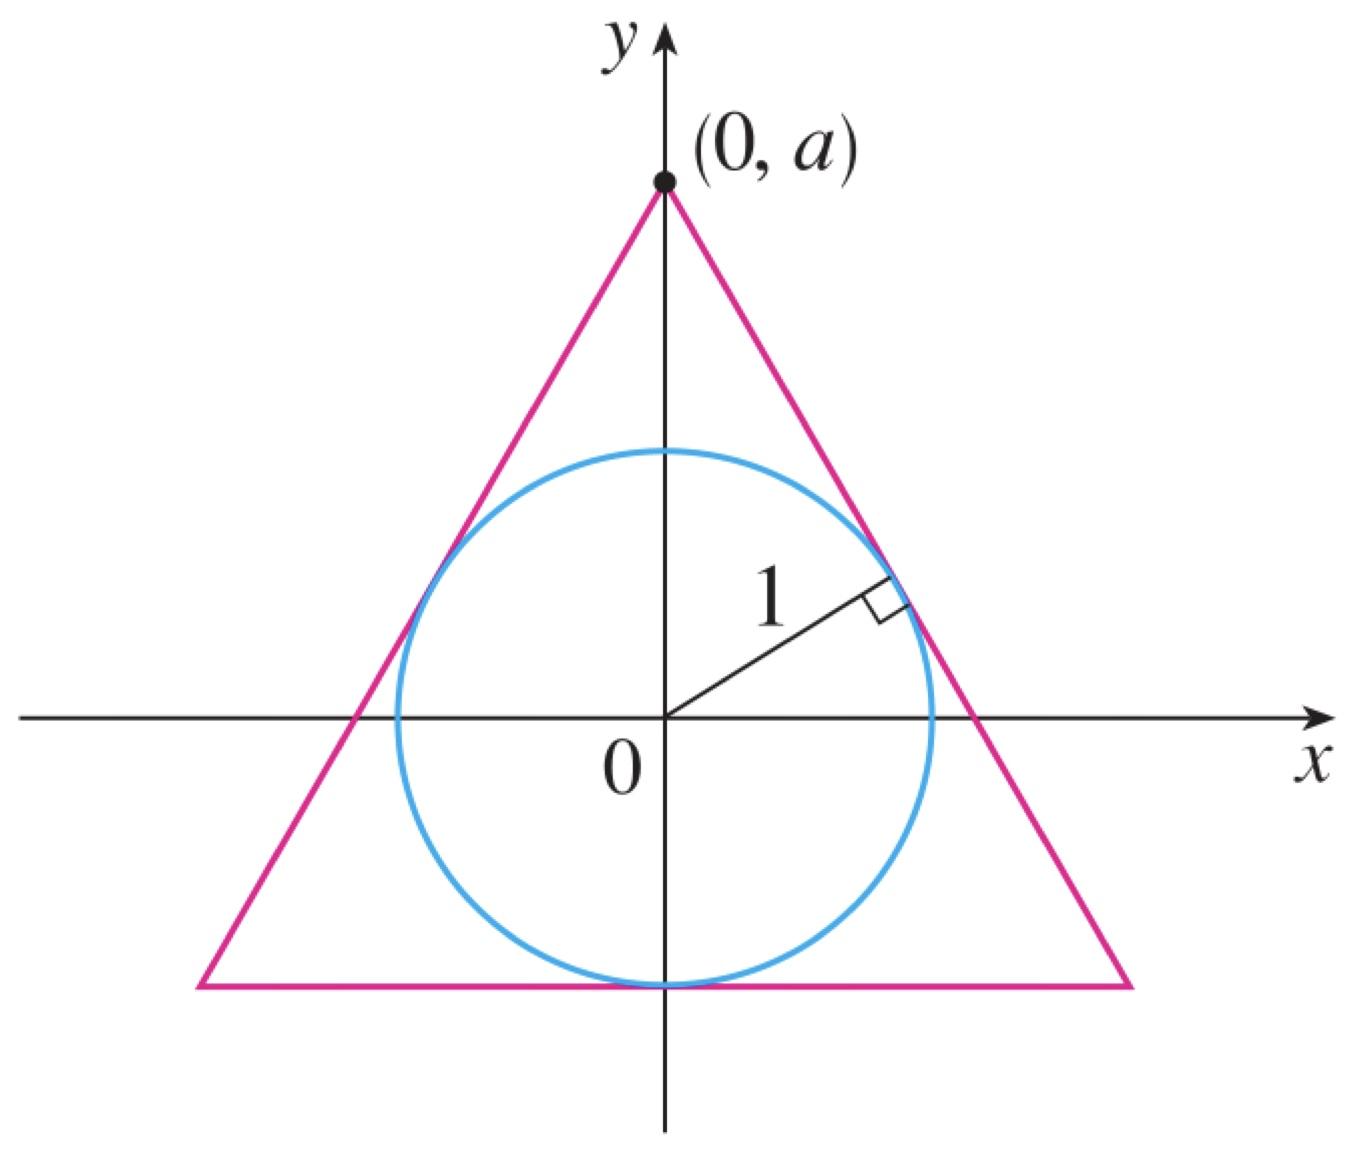 (0, a) 1